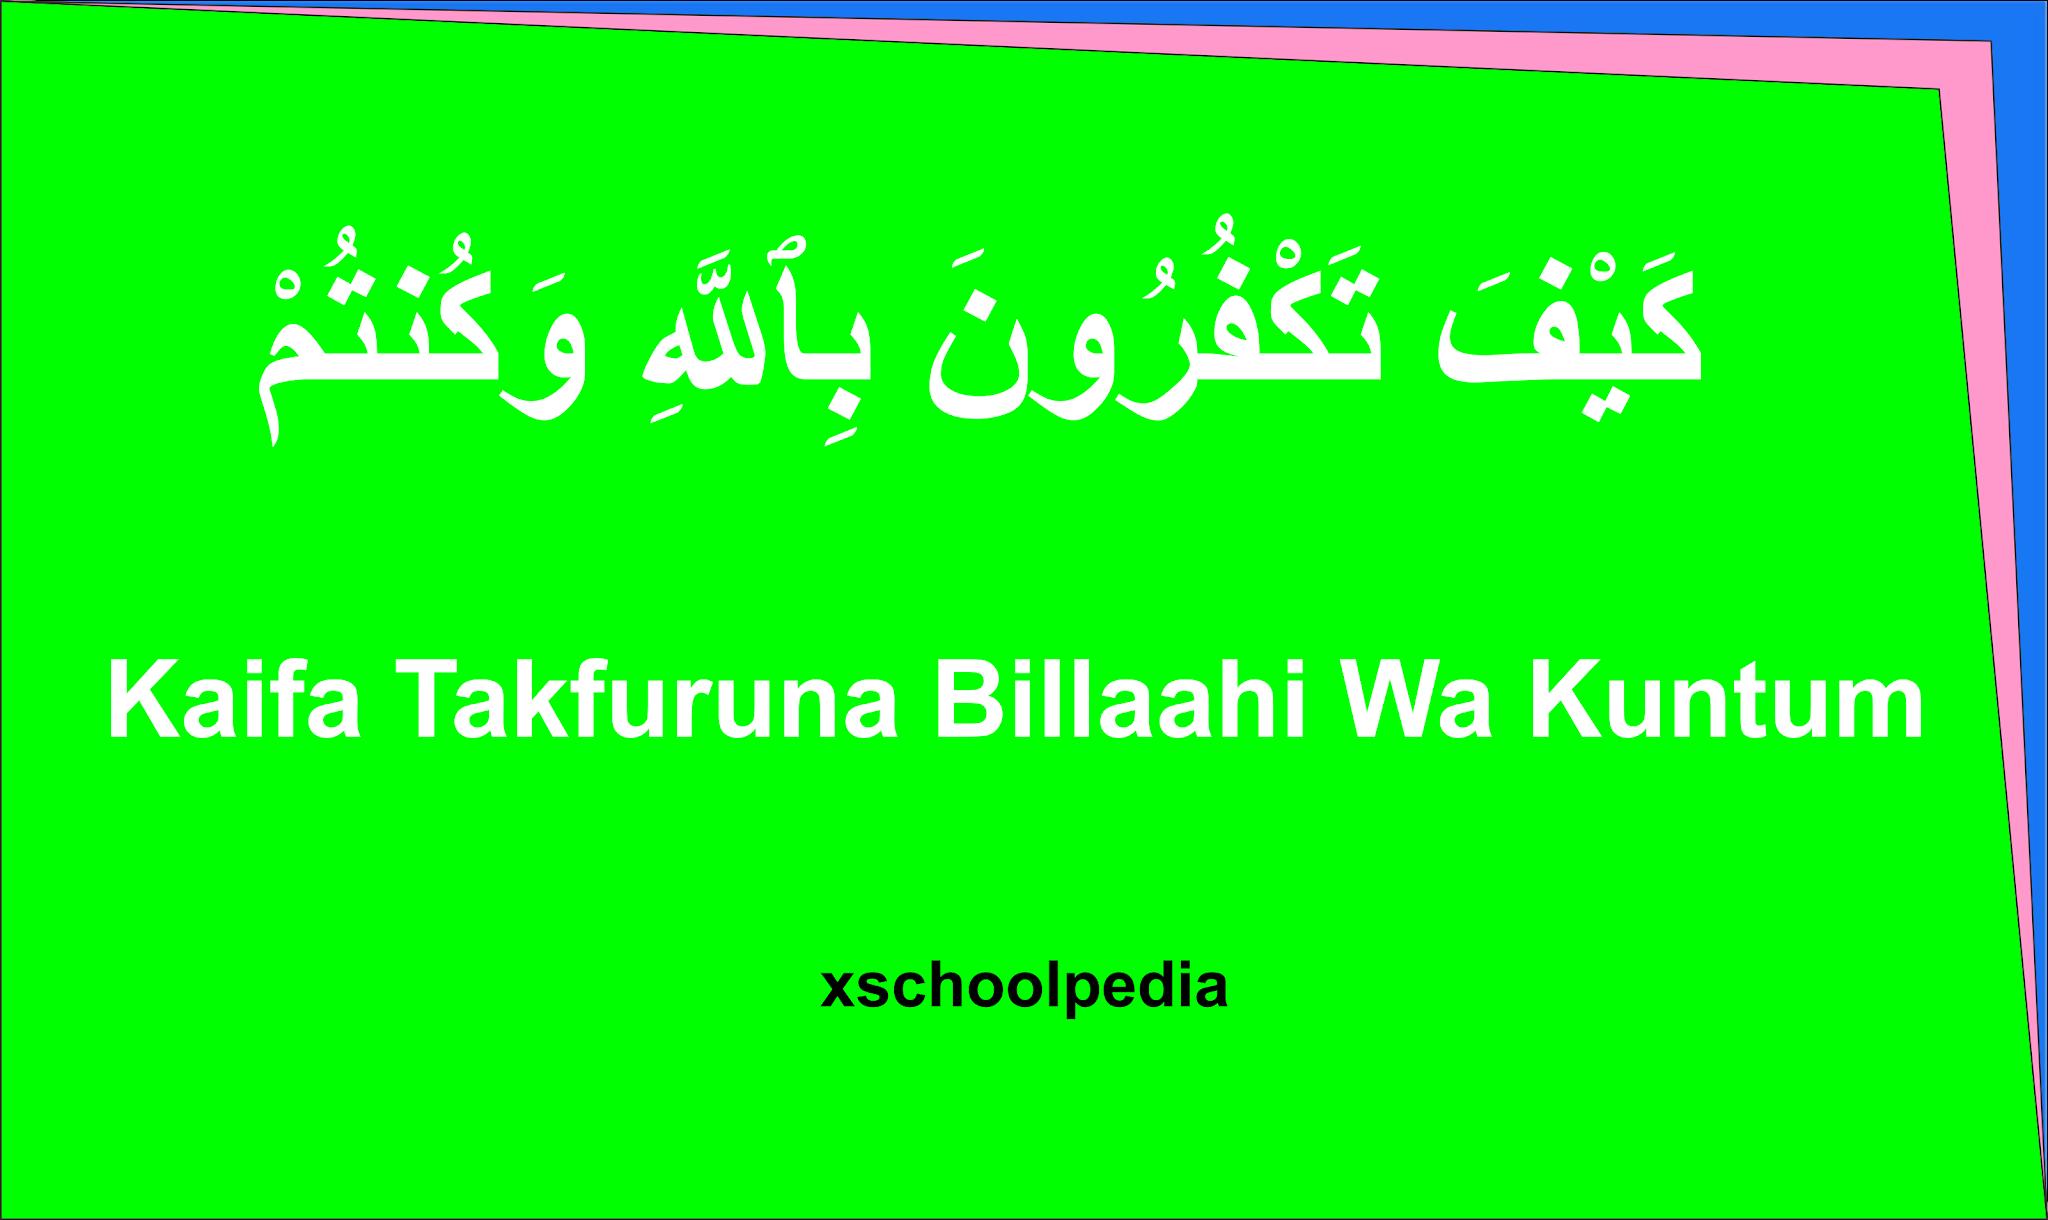 Kaifa Takfuruna Billahi Wa Kuntum Artinya